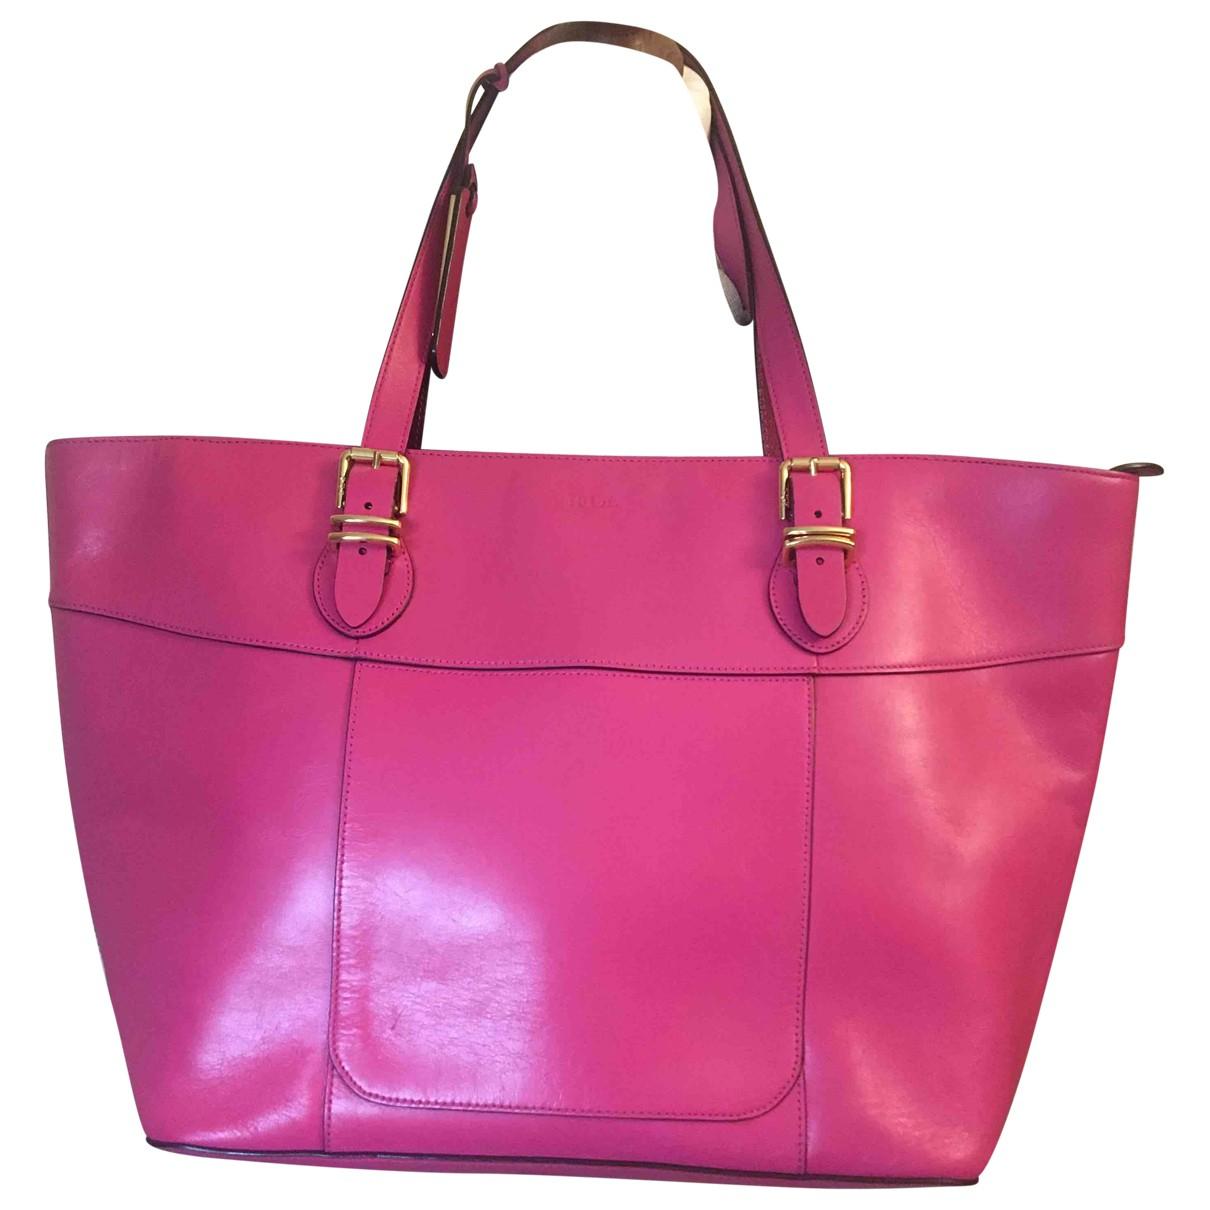 Ralph Lauren - Sac a main   pour femme en cuir - rose